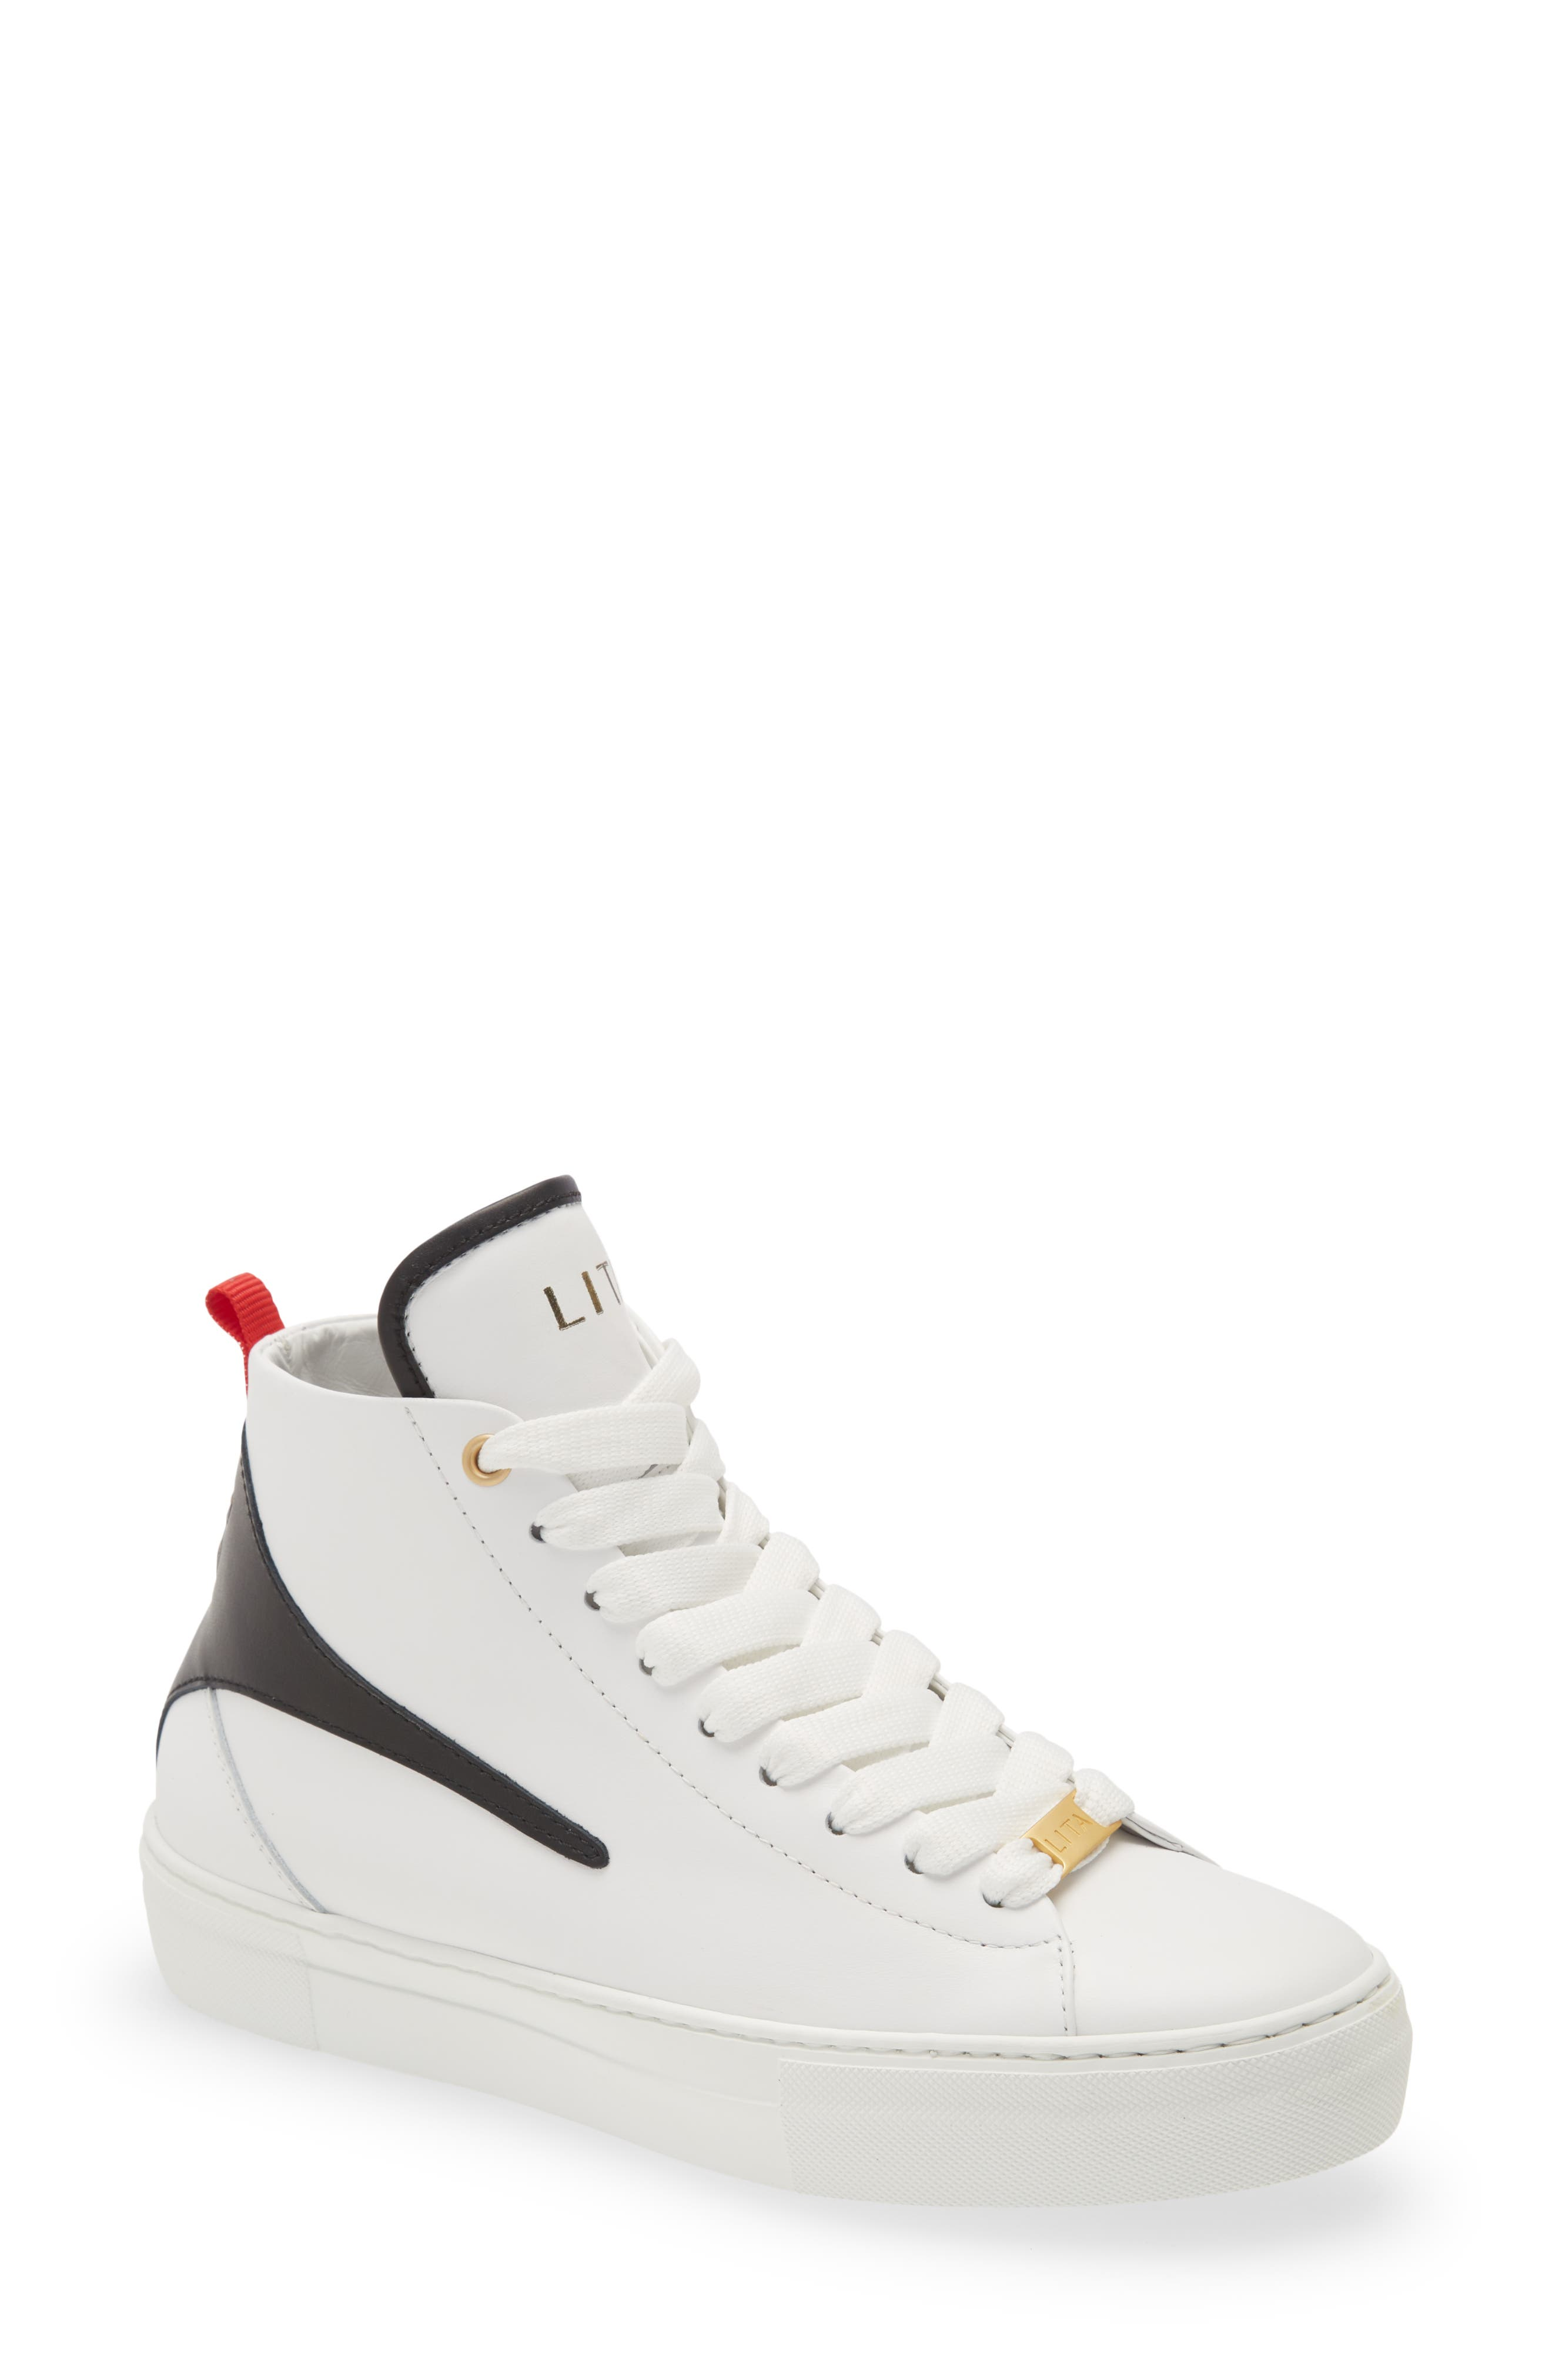 Fang High Top Sneaker